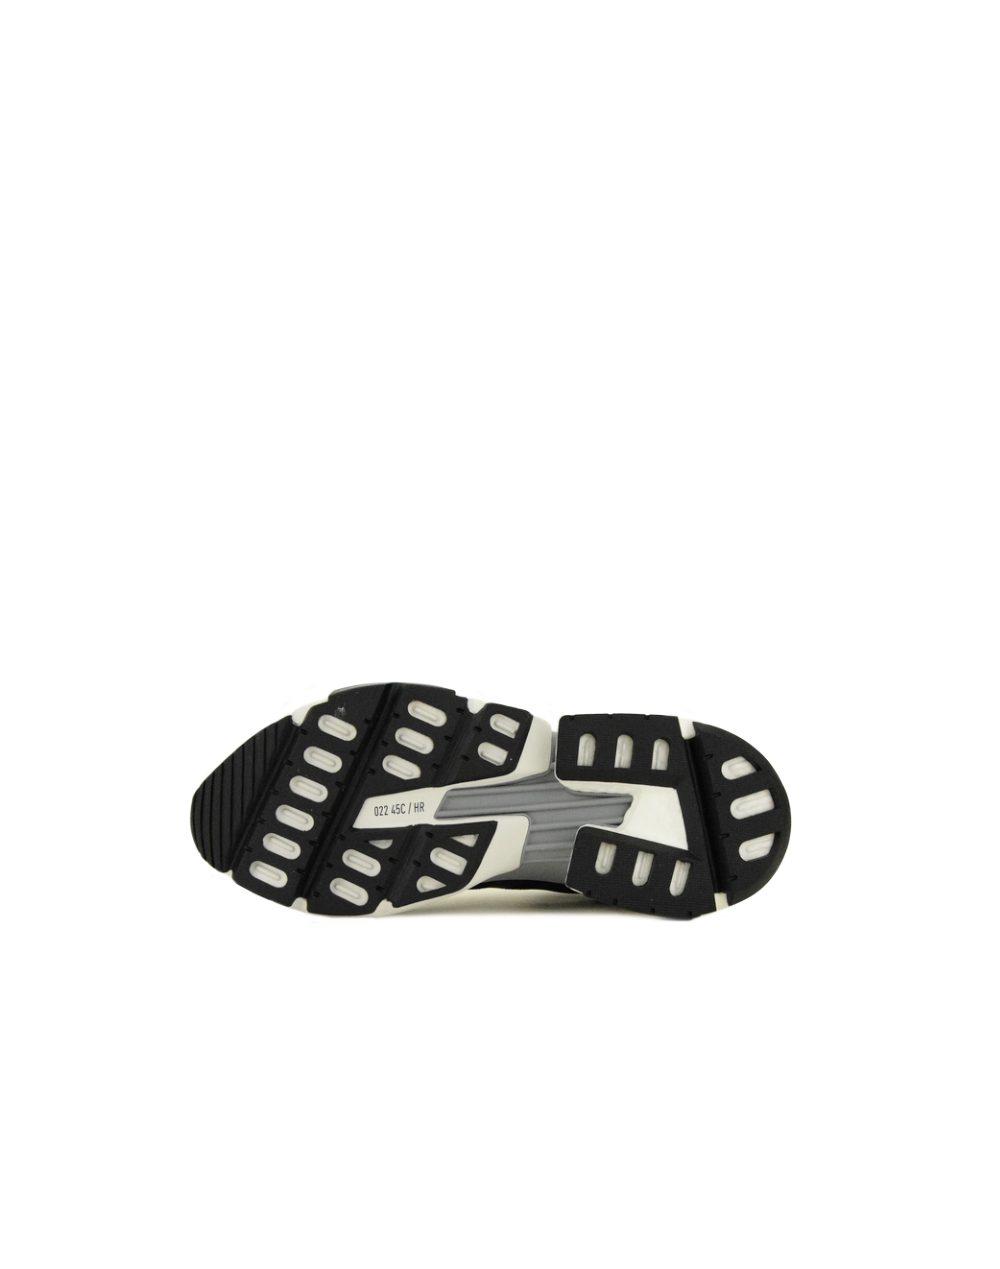 Adidas POD-S3.1 Black (BD7737)